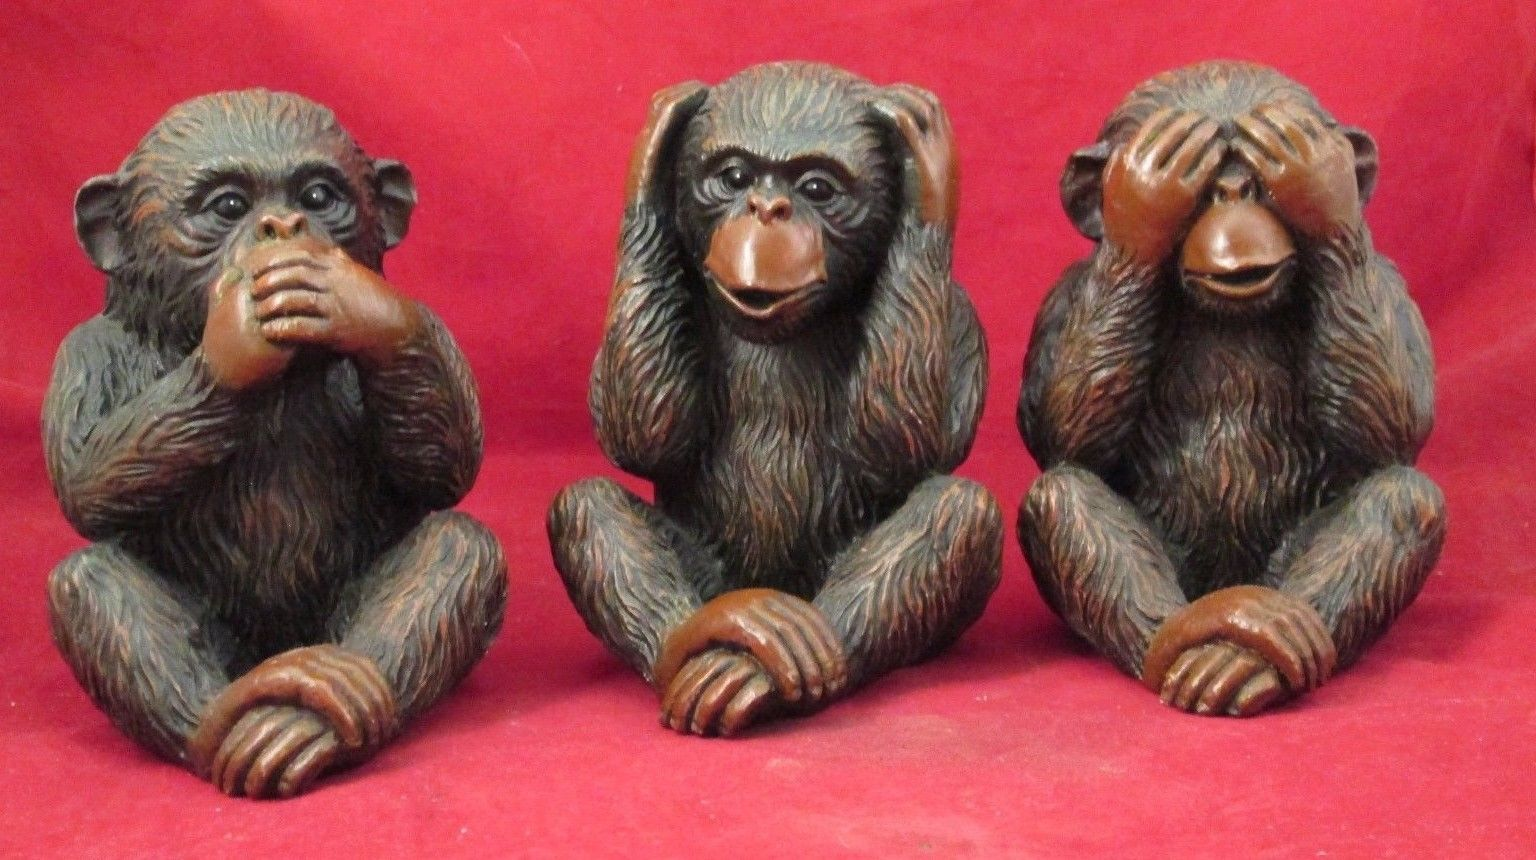 ELEPHANT AND FROG SEE NO MONKEY SET OF 4 PIG SPEAK NO EVIL SET HEAR NO